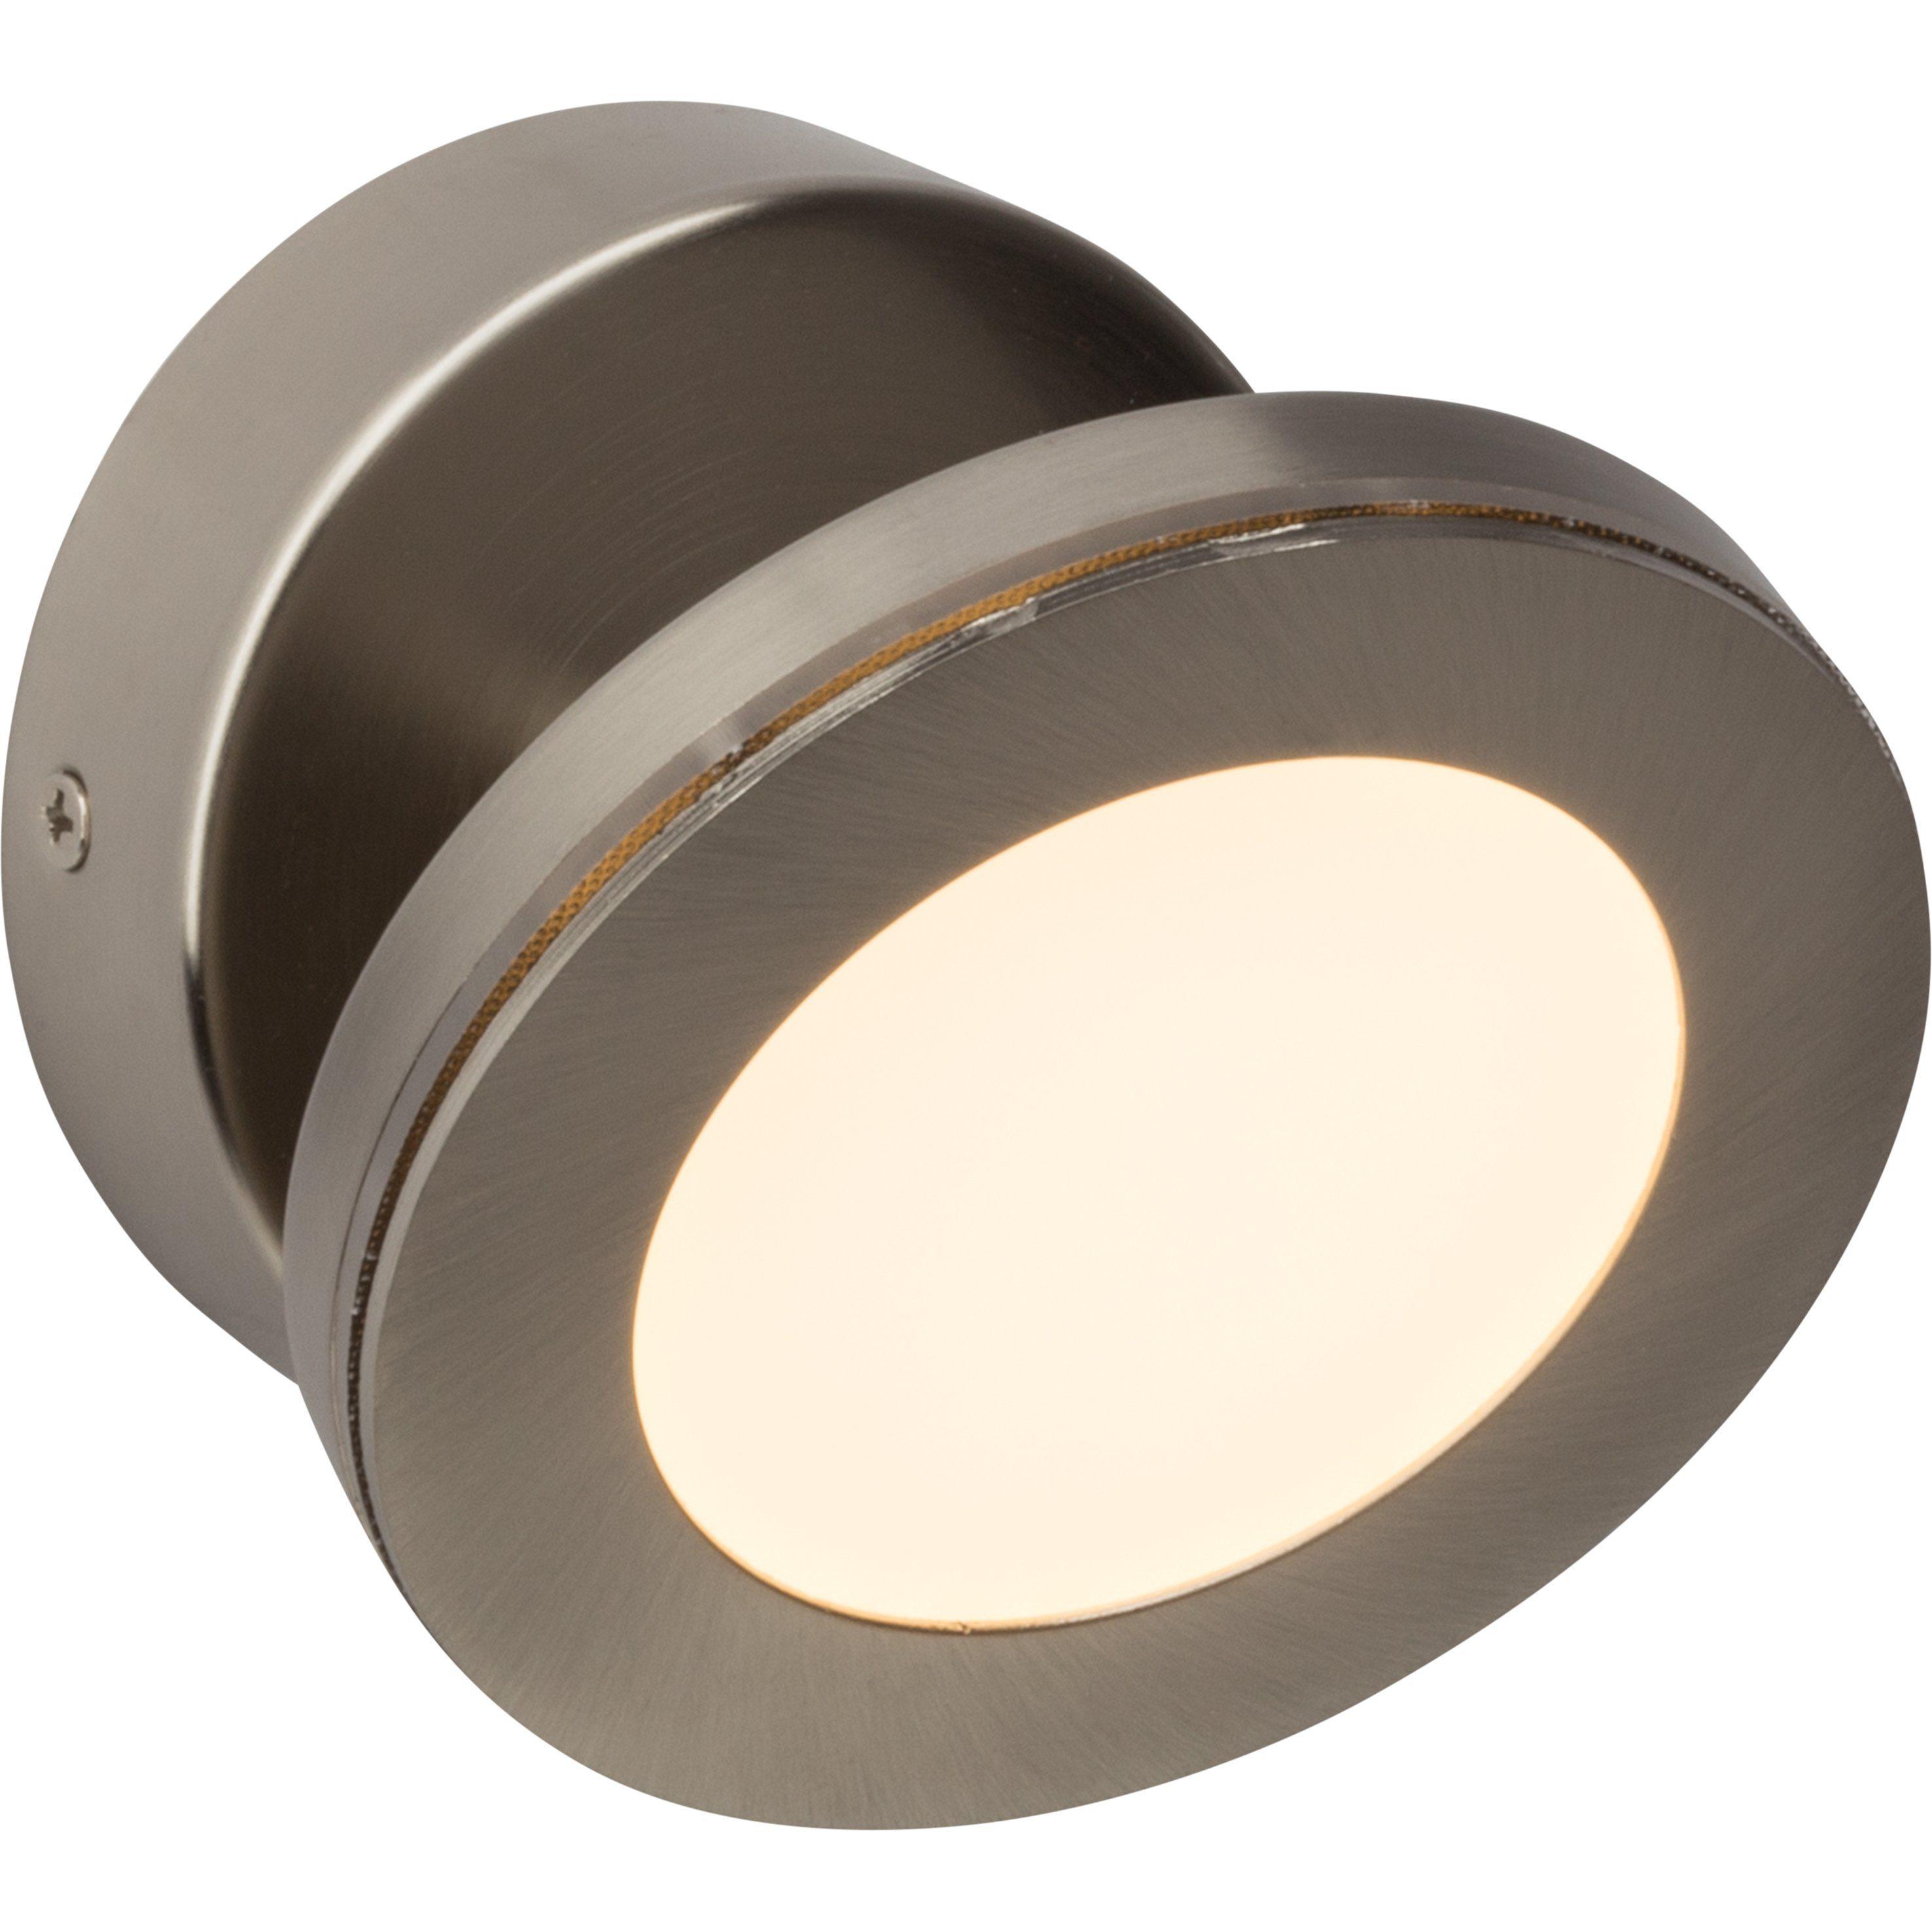 Brilliant Leuchten Sense Round LED Wandspot eisen